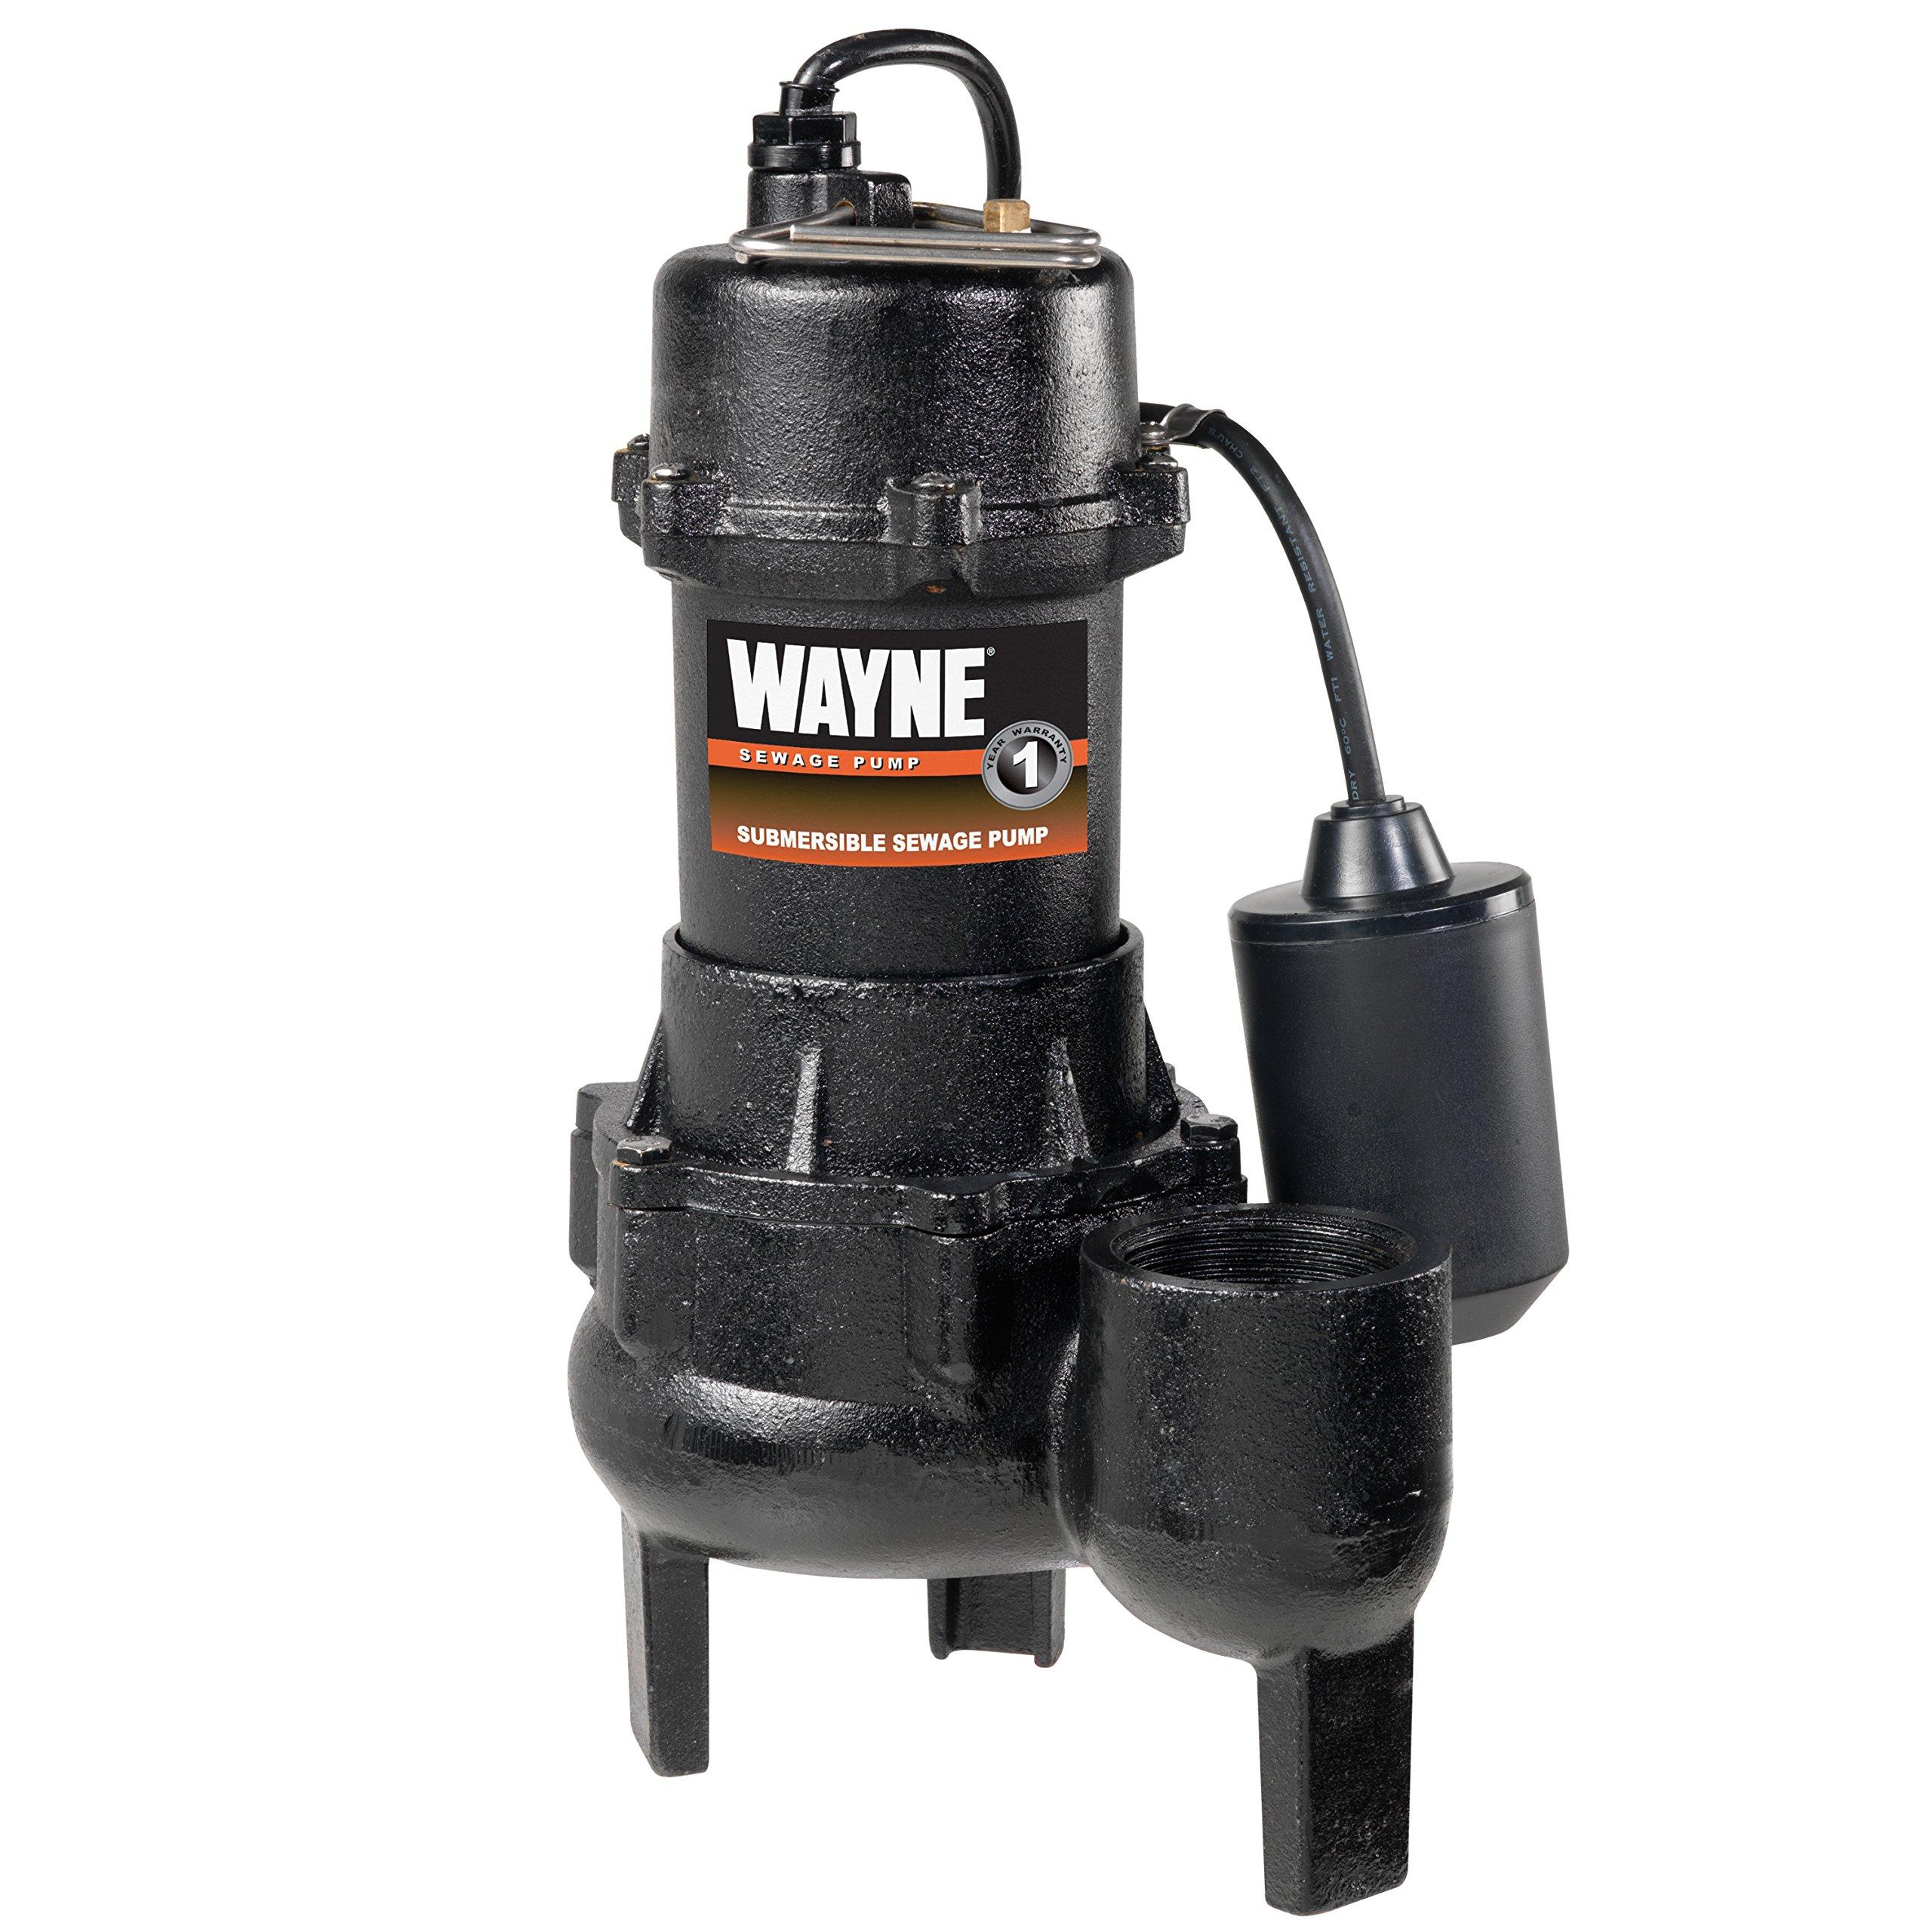 Wayne RPP50 Sewage Pump by Wayne